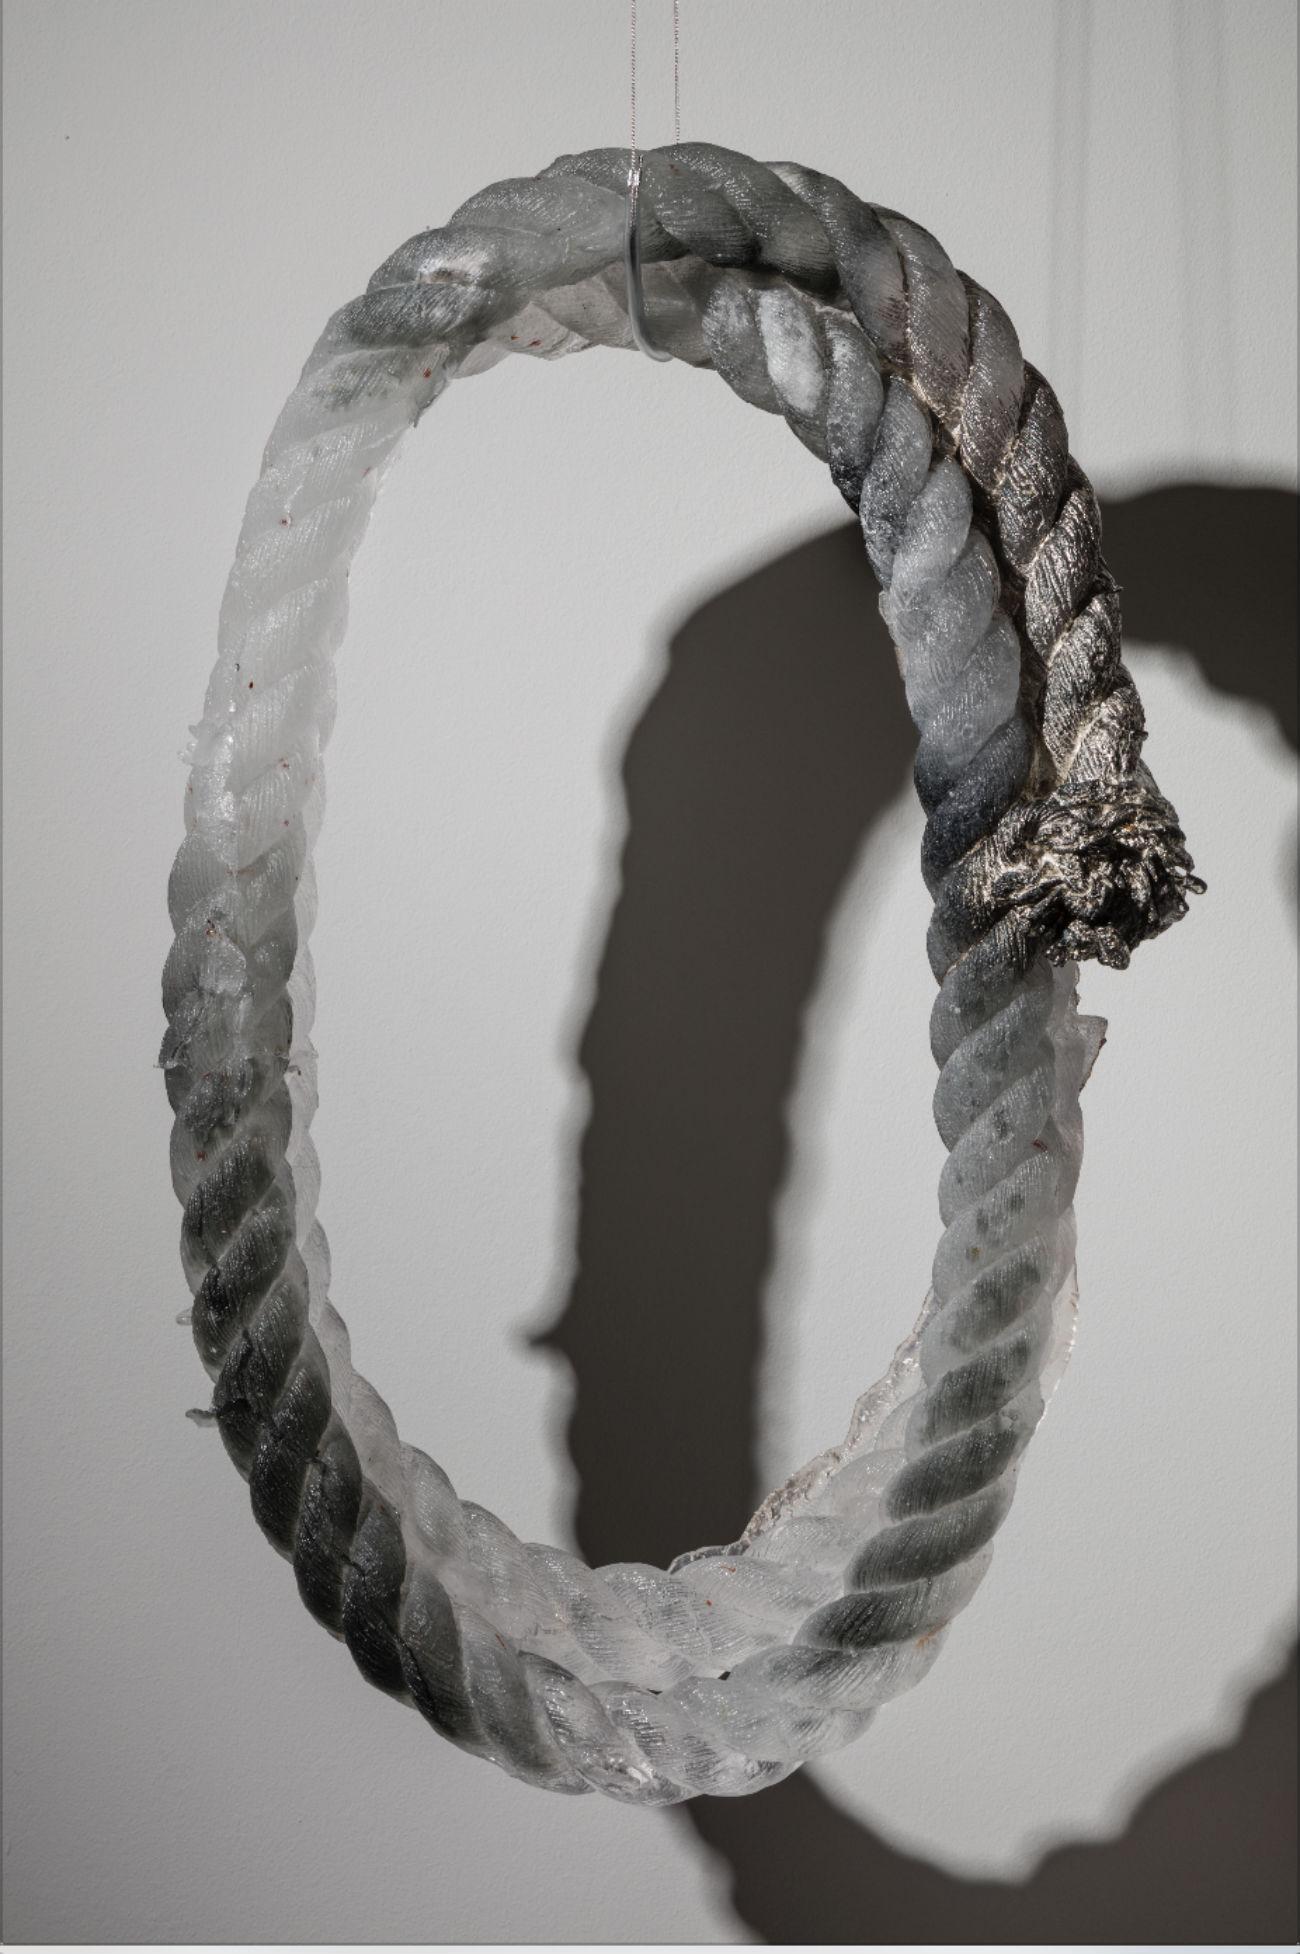 Nœud ovale par Maria Kochenkova. Crédit : Clara Scremini Gallery